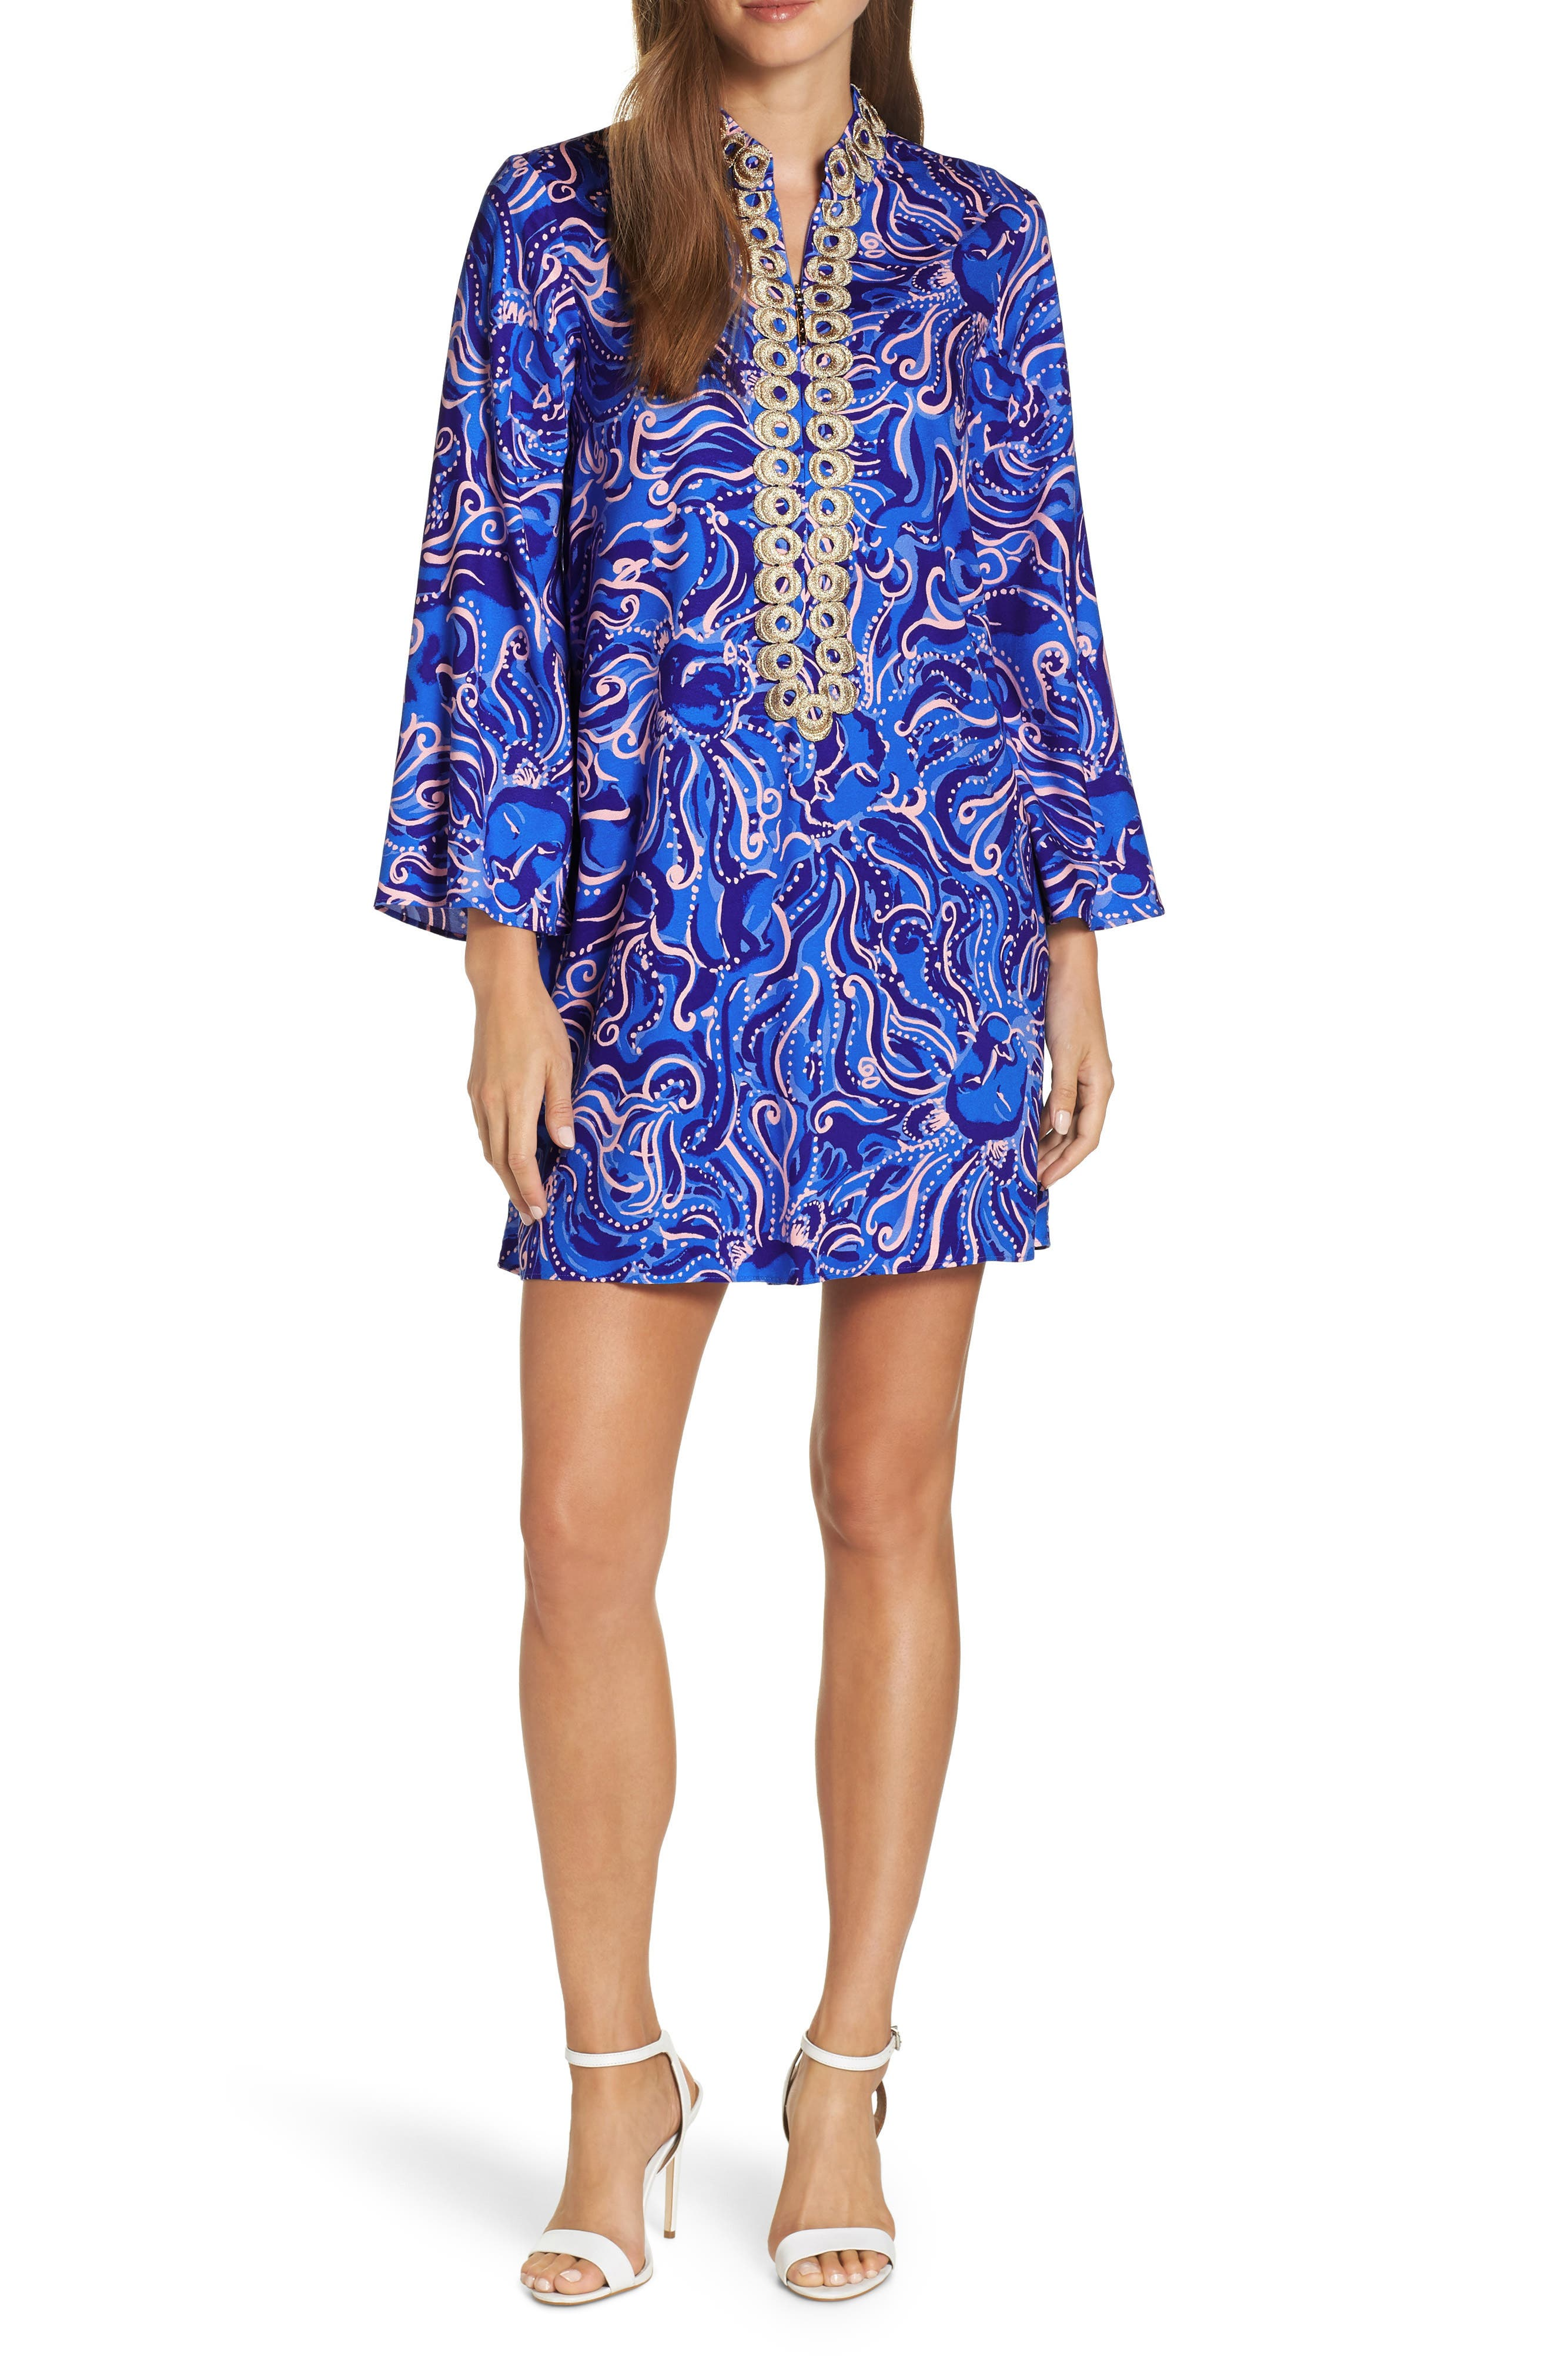 Lilly Pulitzer Gracelynn Tunic Dress